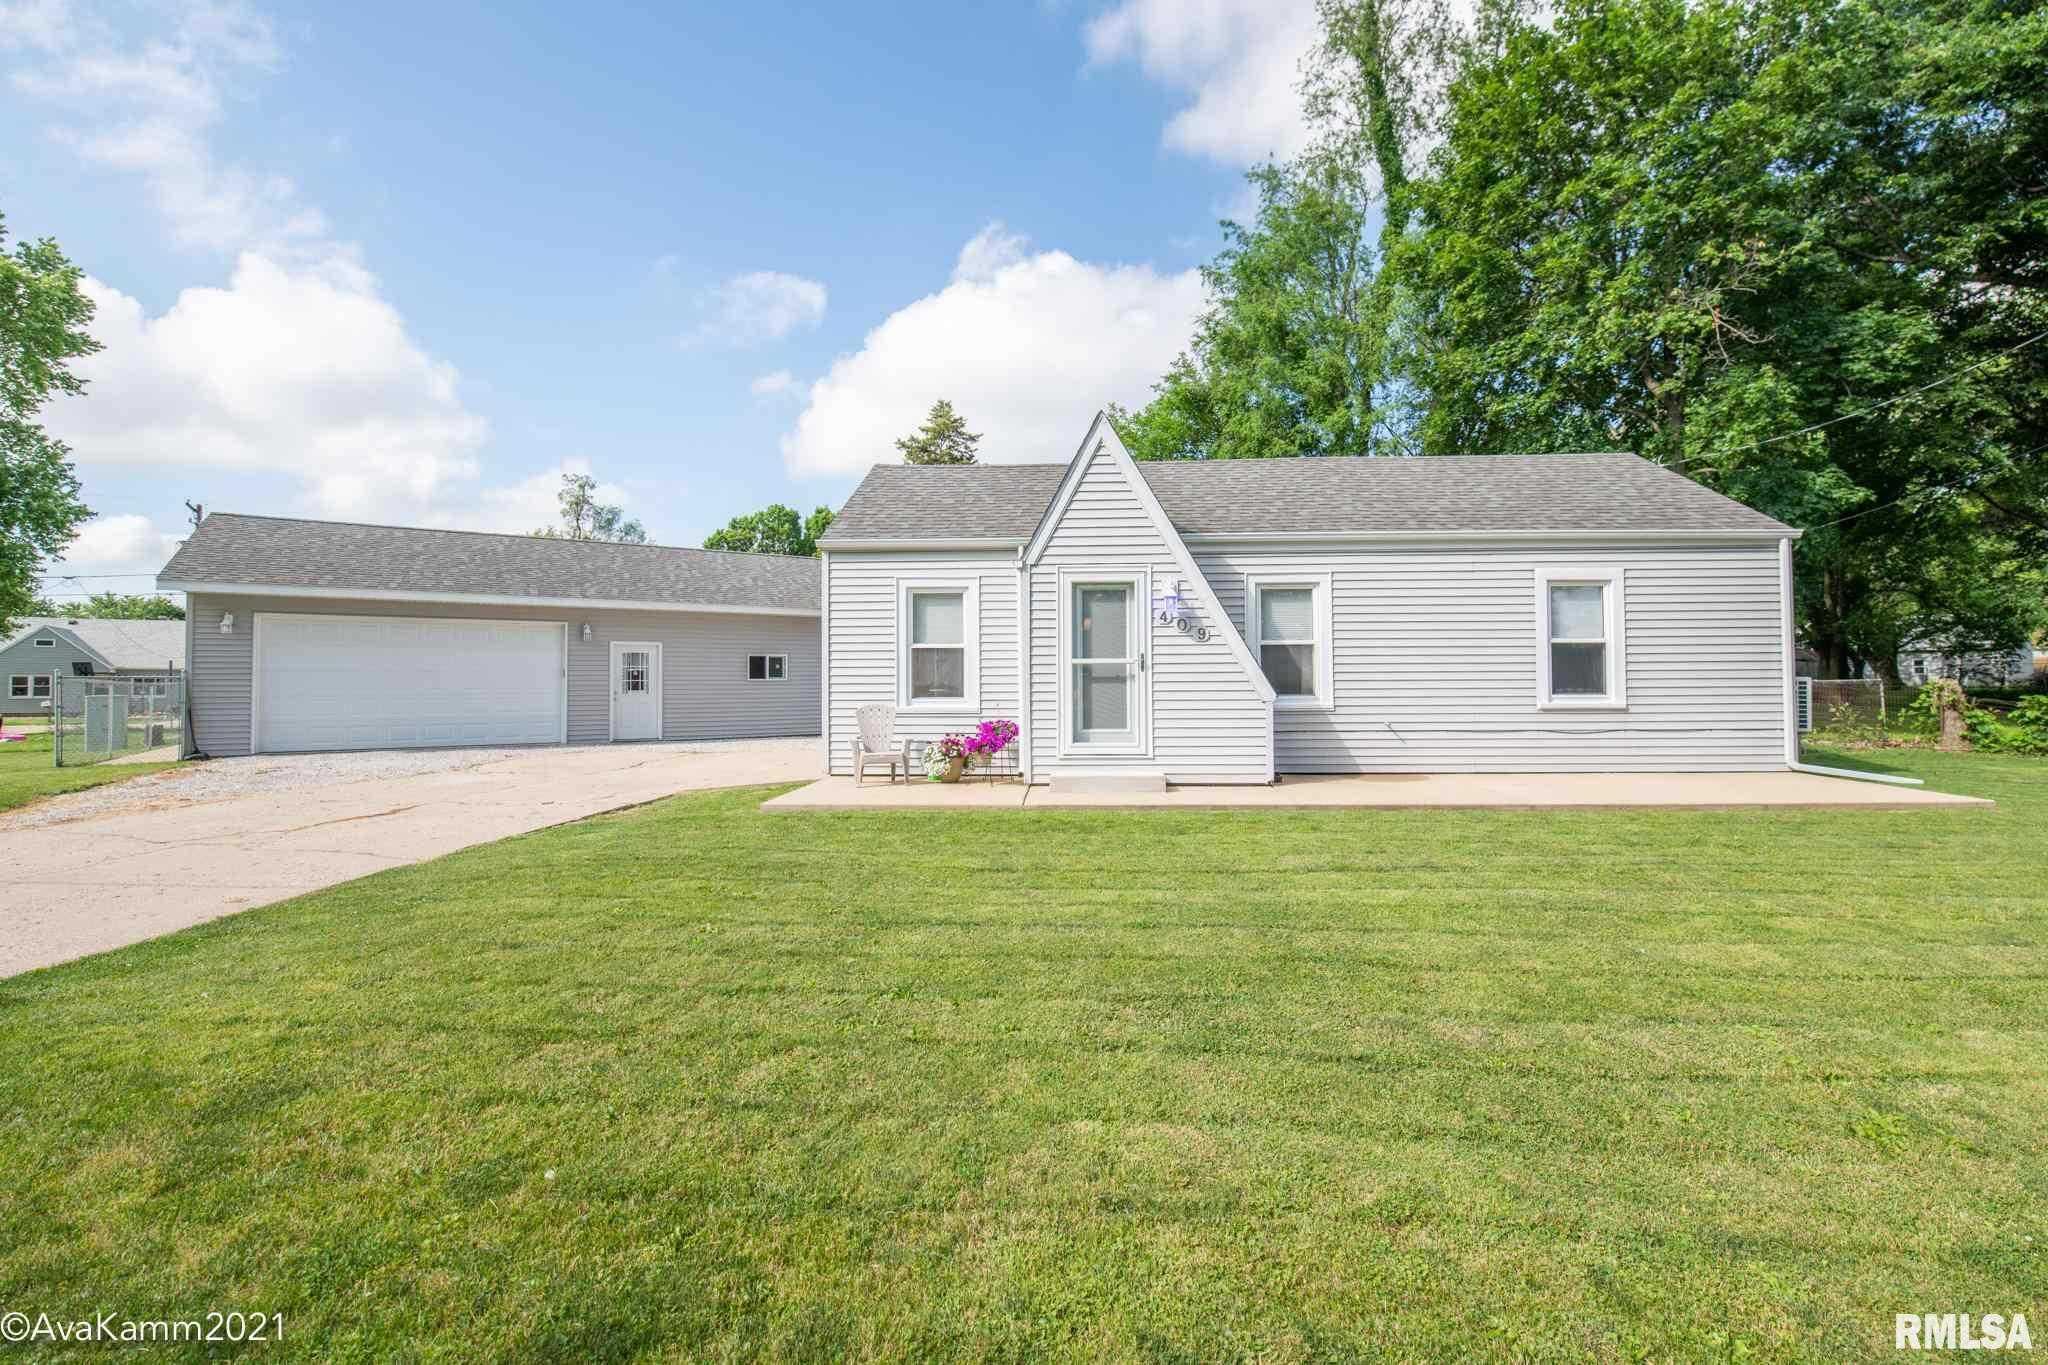 $129,500 - 1Br/1Ba -  for Sale in Bellevue Acres, Peoria